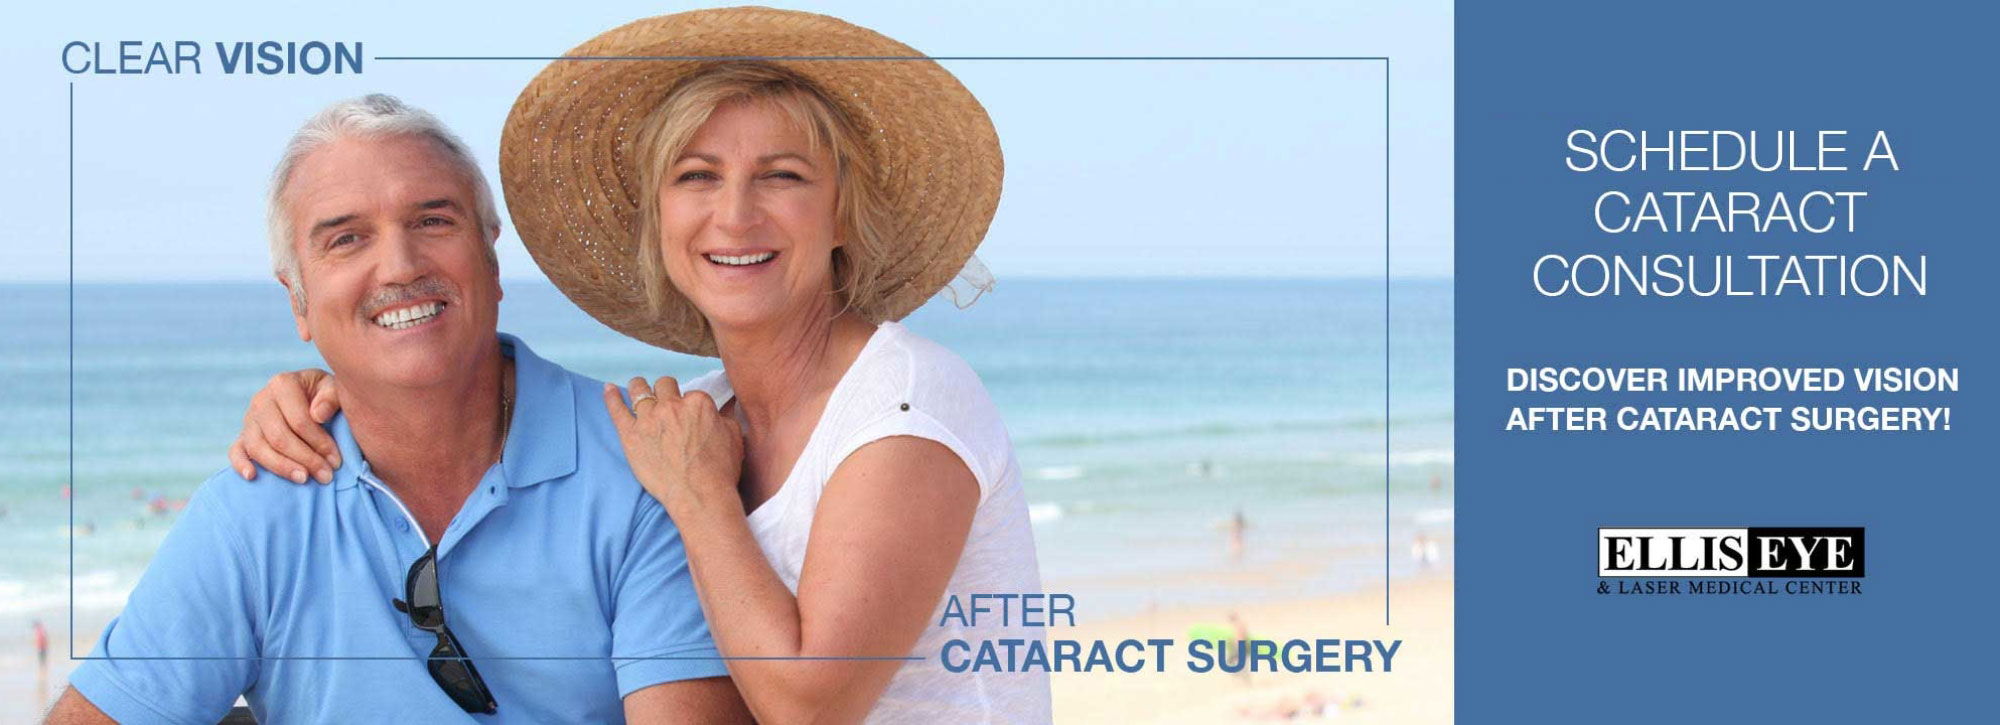 cataracts-2000x725_c